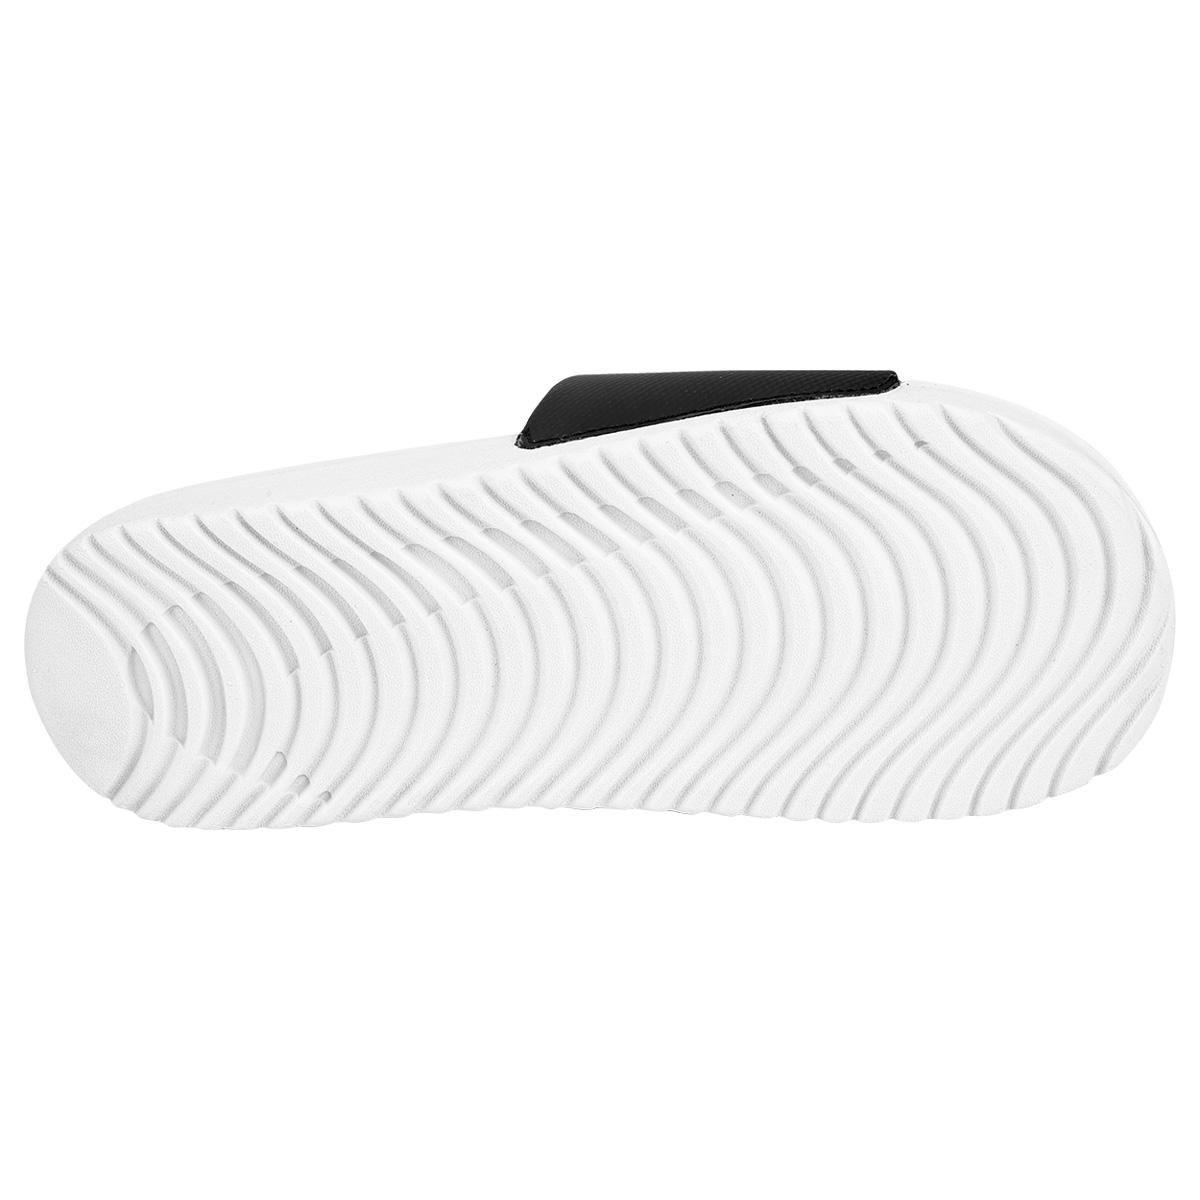 071c908a4 Sandália Nike Wmns Kawa Slide - Compre Agora